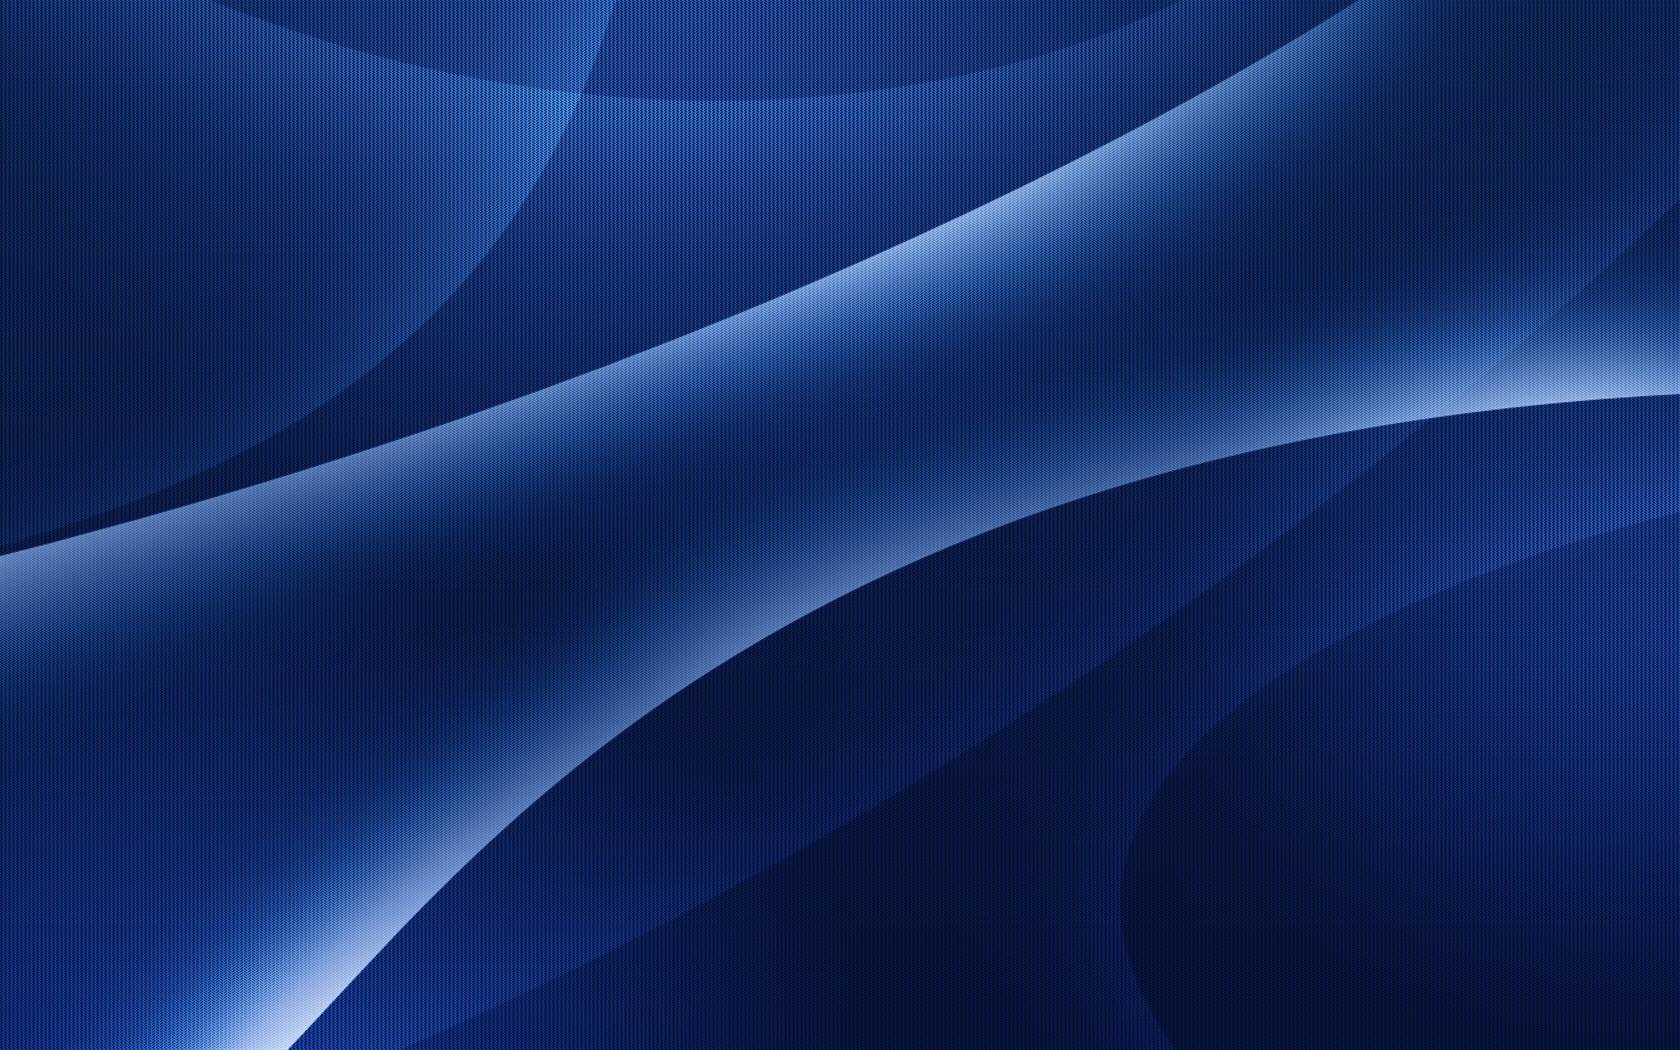 abstract wallpapers hd dark blue - HD Desktop Wallpapers ... Dark Blue Background Hd